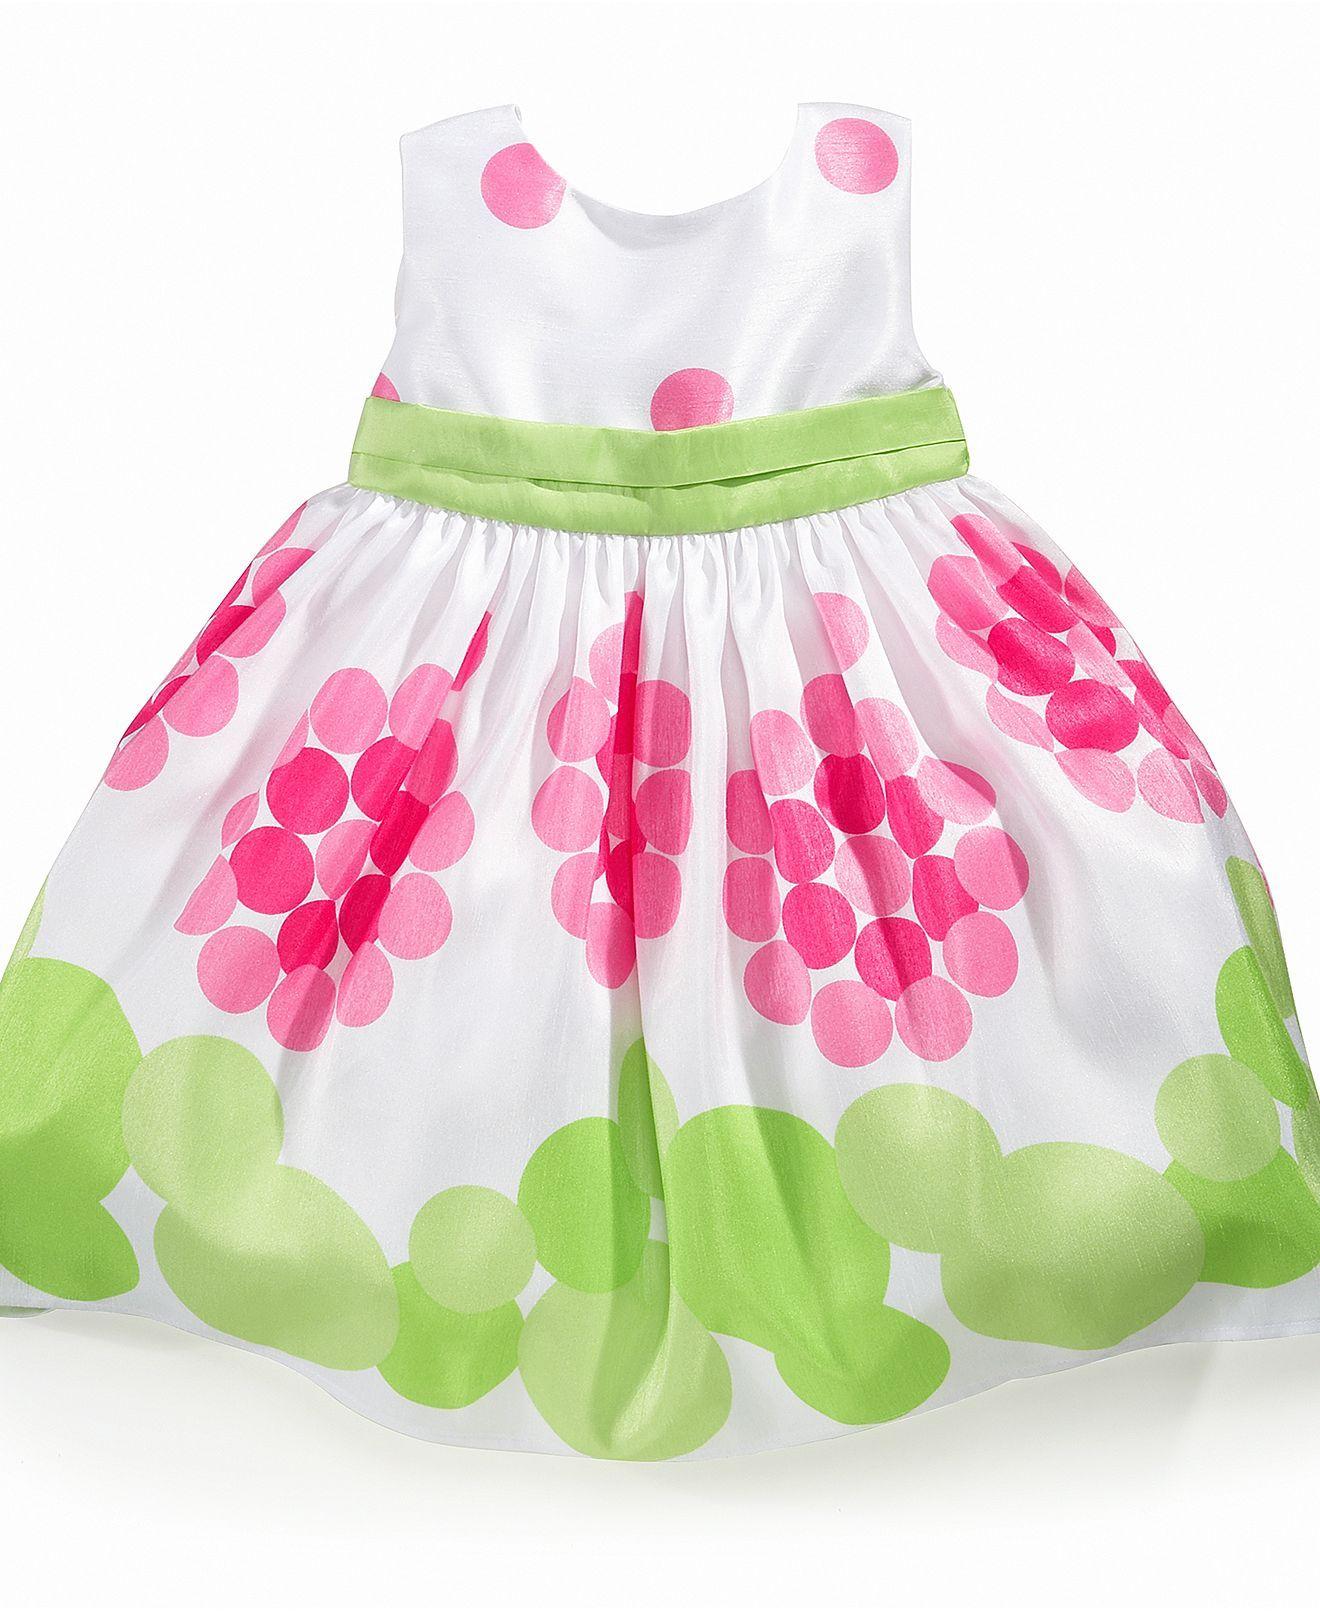 Blueberi Boulevard Baby Dress, Baby Girls Dot Dress - Kids Baby ...